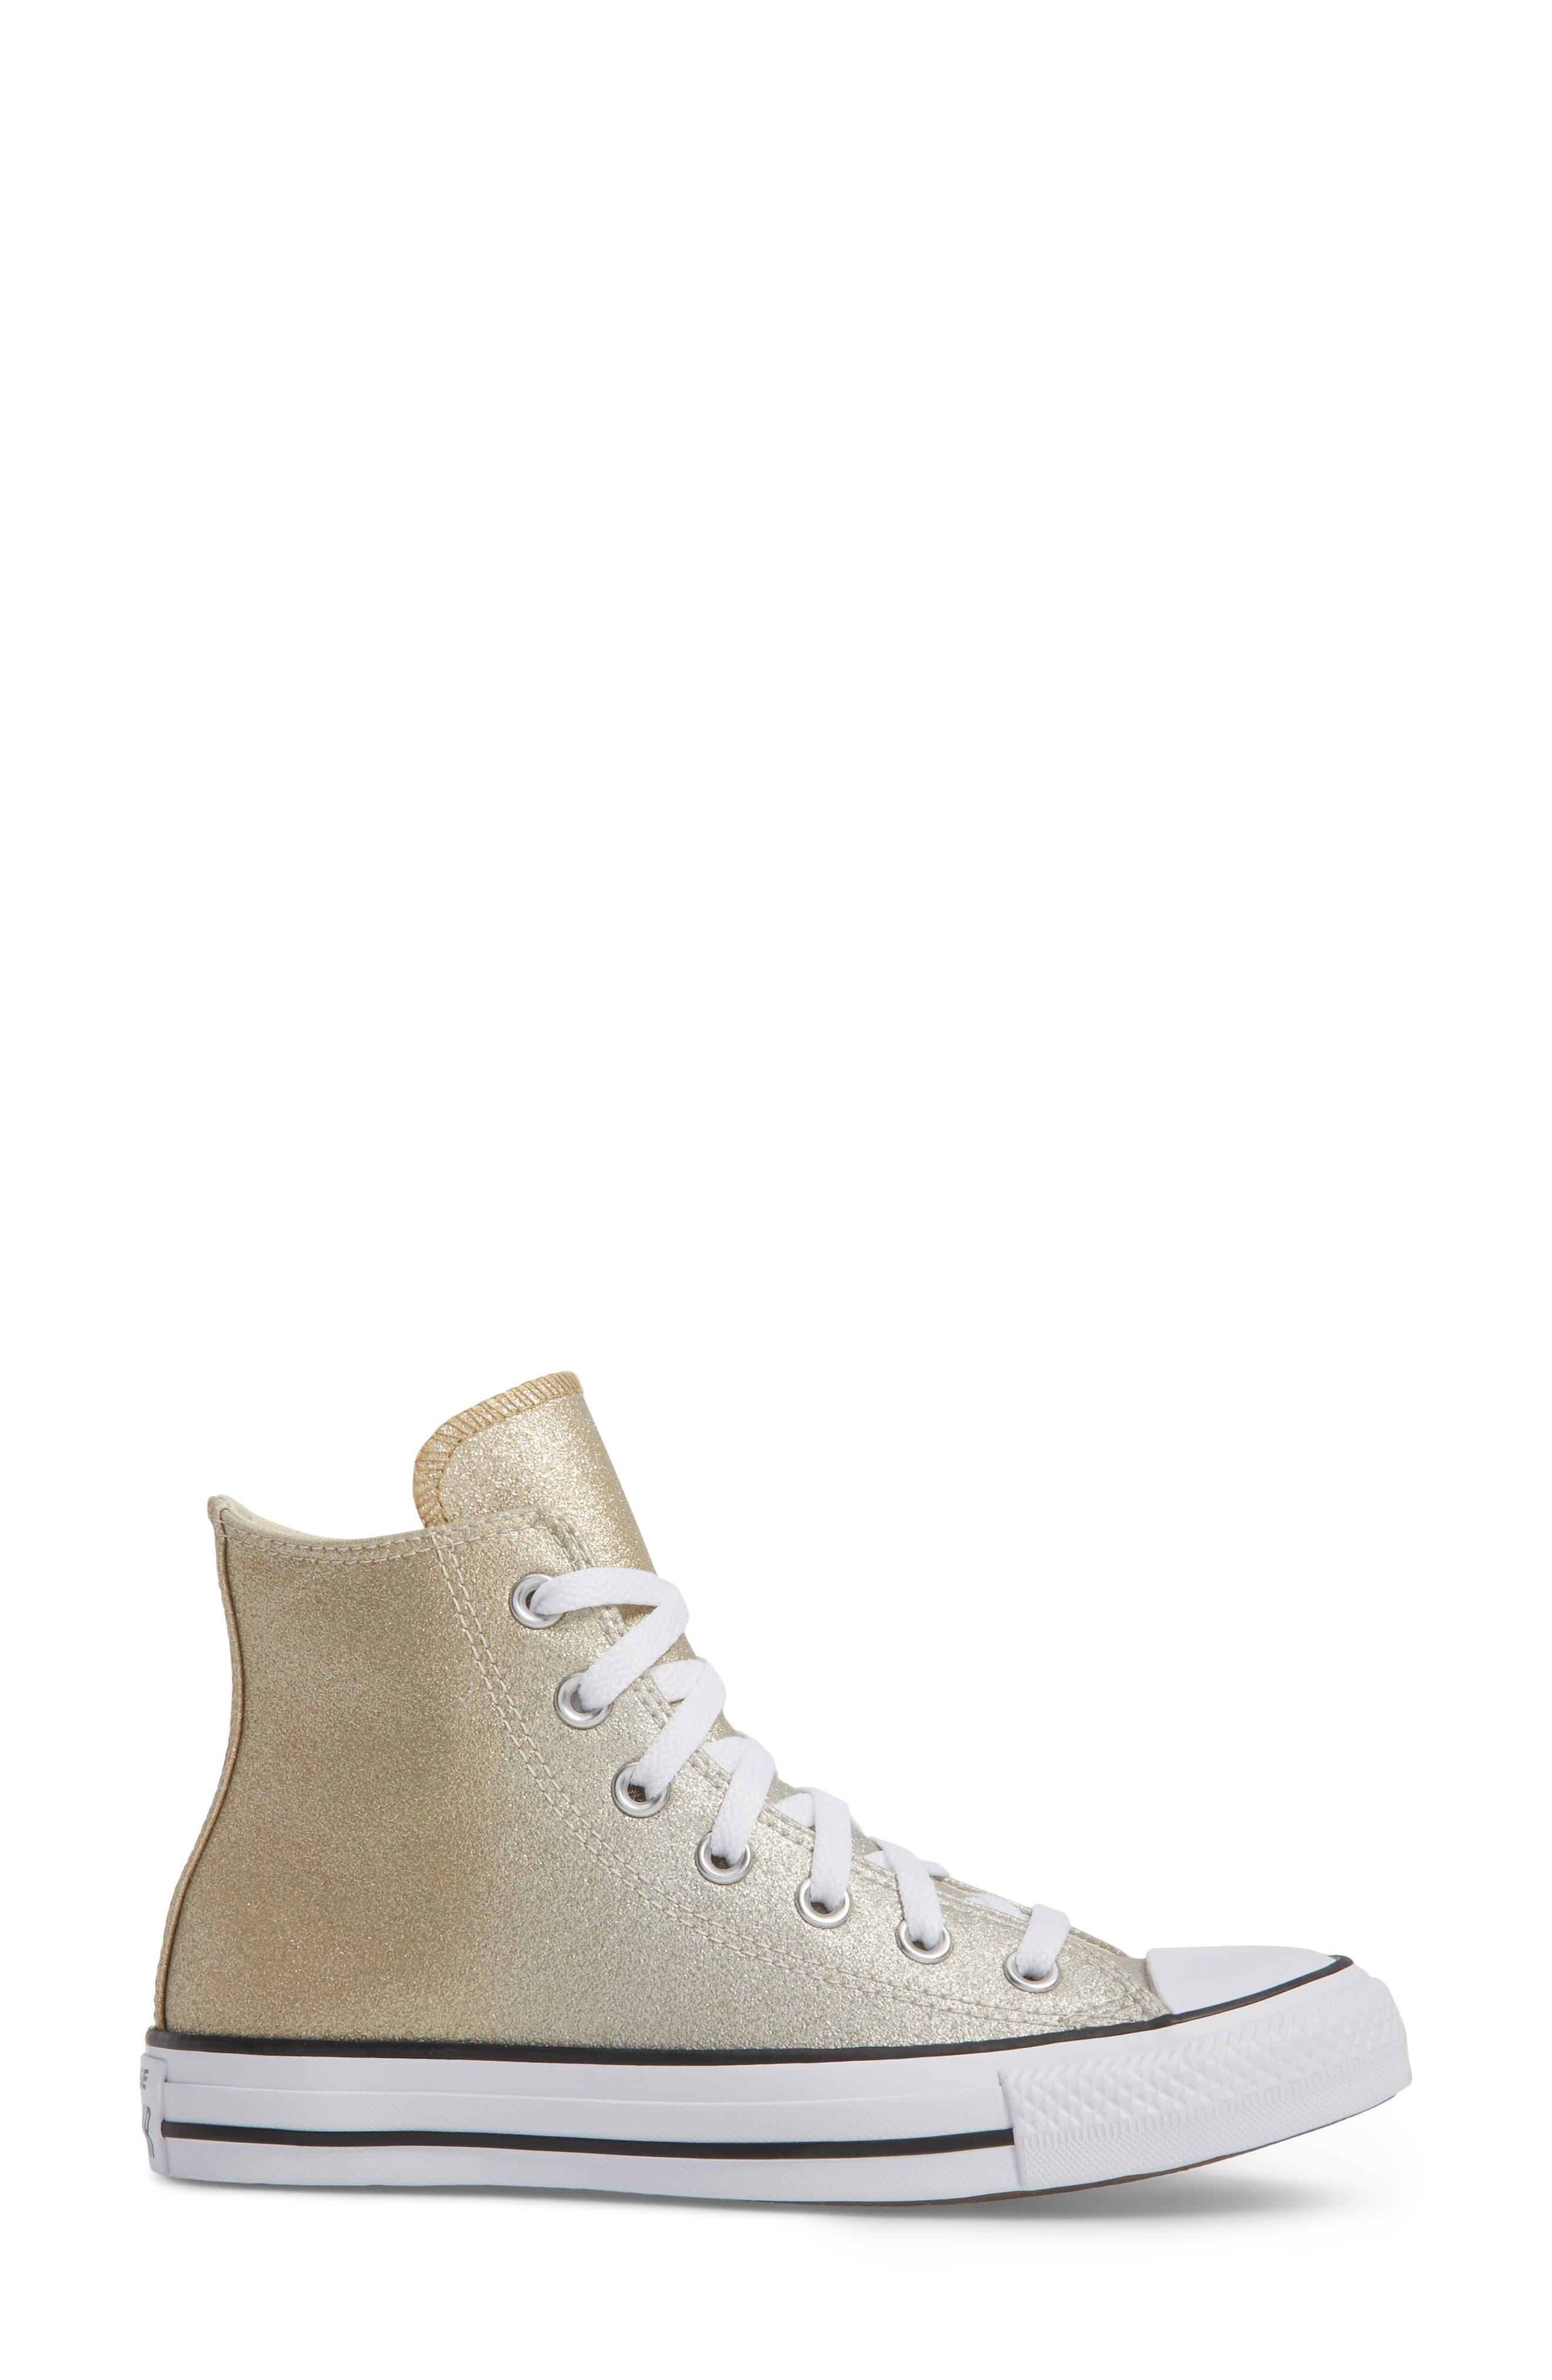 CONVERSE,                             Chuck Taylor<sup>®</sup> All Star<sup>®</sup> Ombré Metallic High Top Sneaker,                             Alternate thumbnail 3, color,                             710